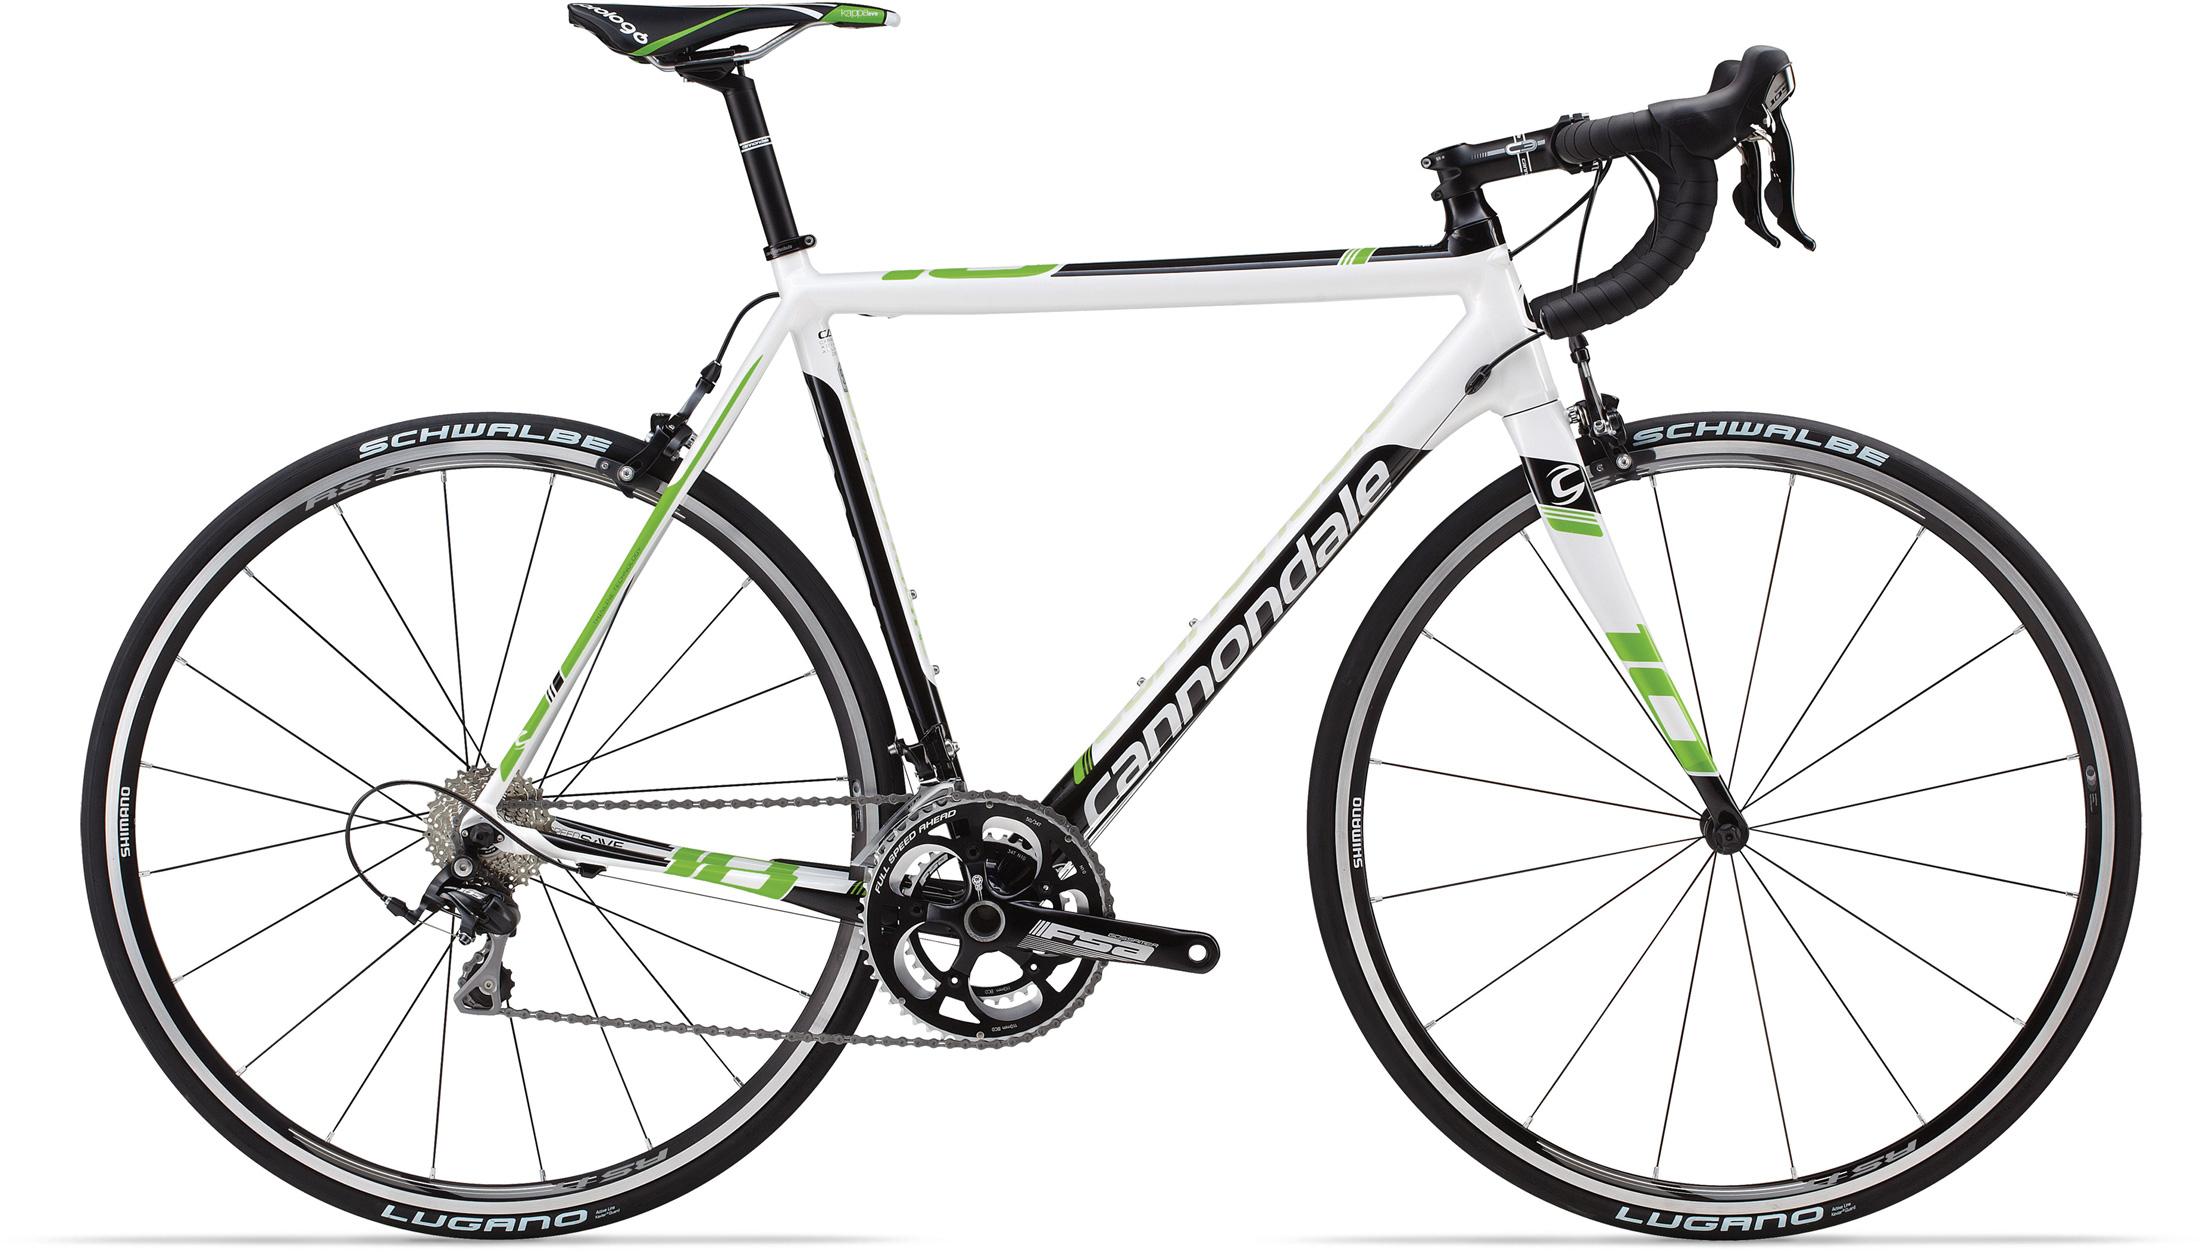 7037bb7f8fa Cannondale CAAD10 5 105 D - Tread Bike Shop